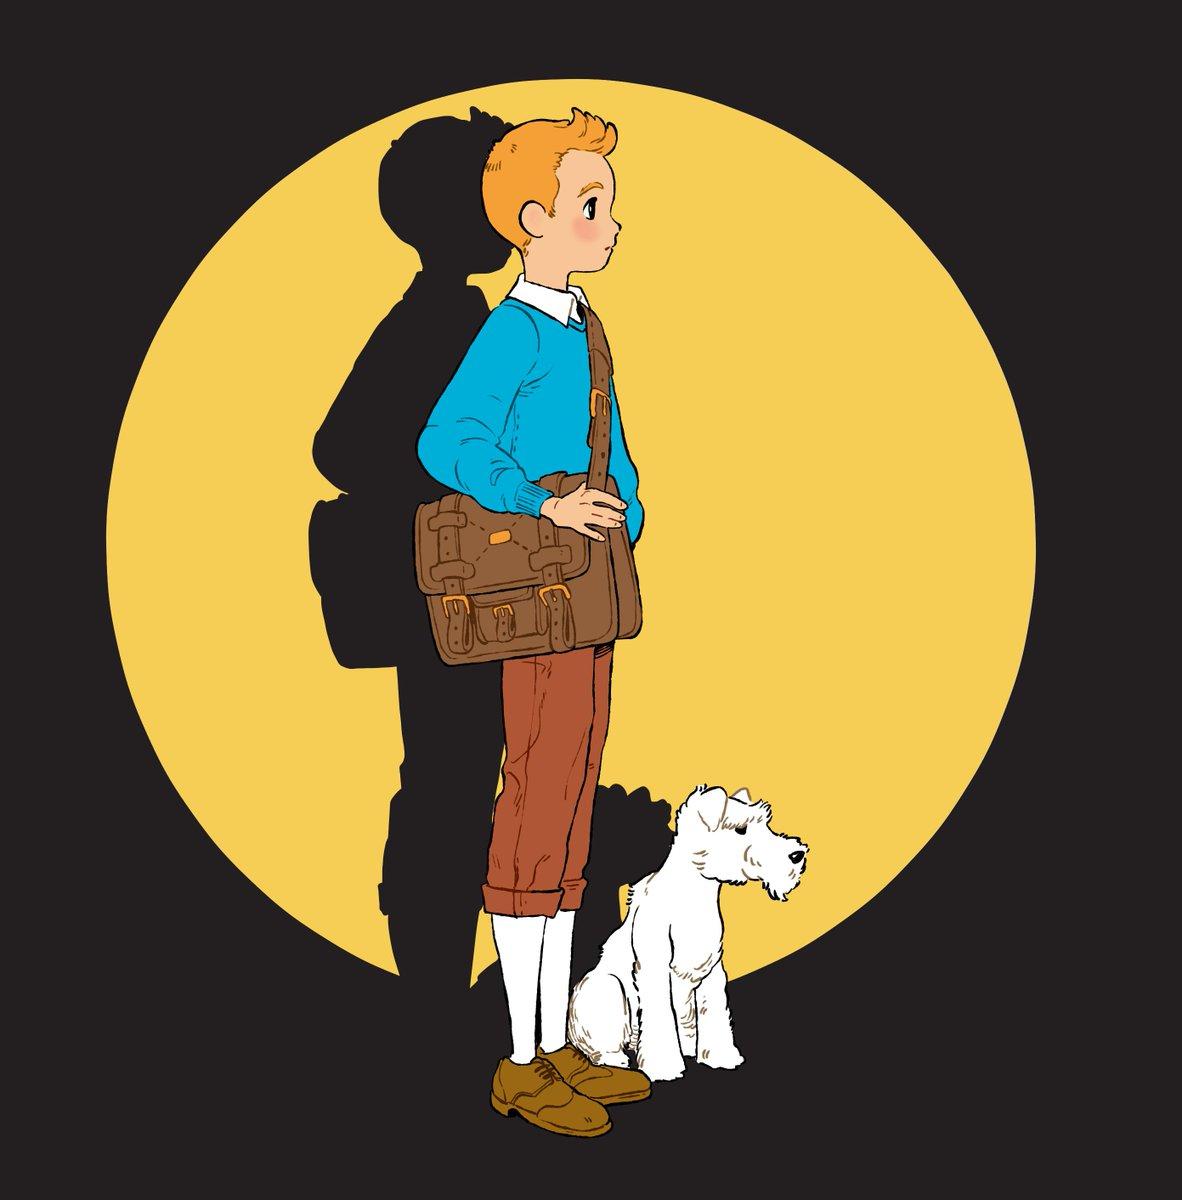 adventurers <br>http://pic.twitter.com/TbysFJN3vP